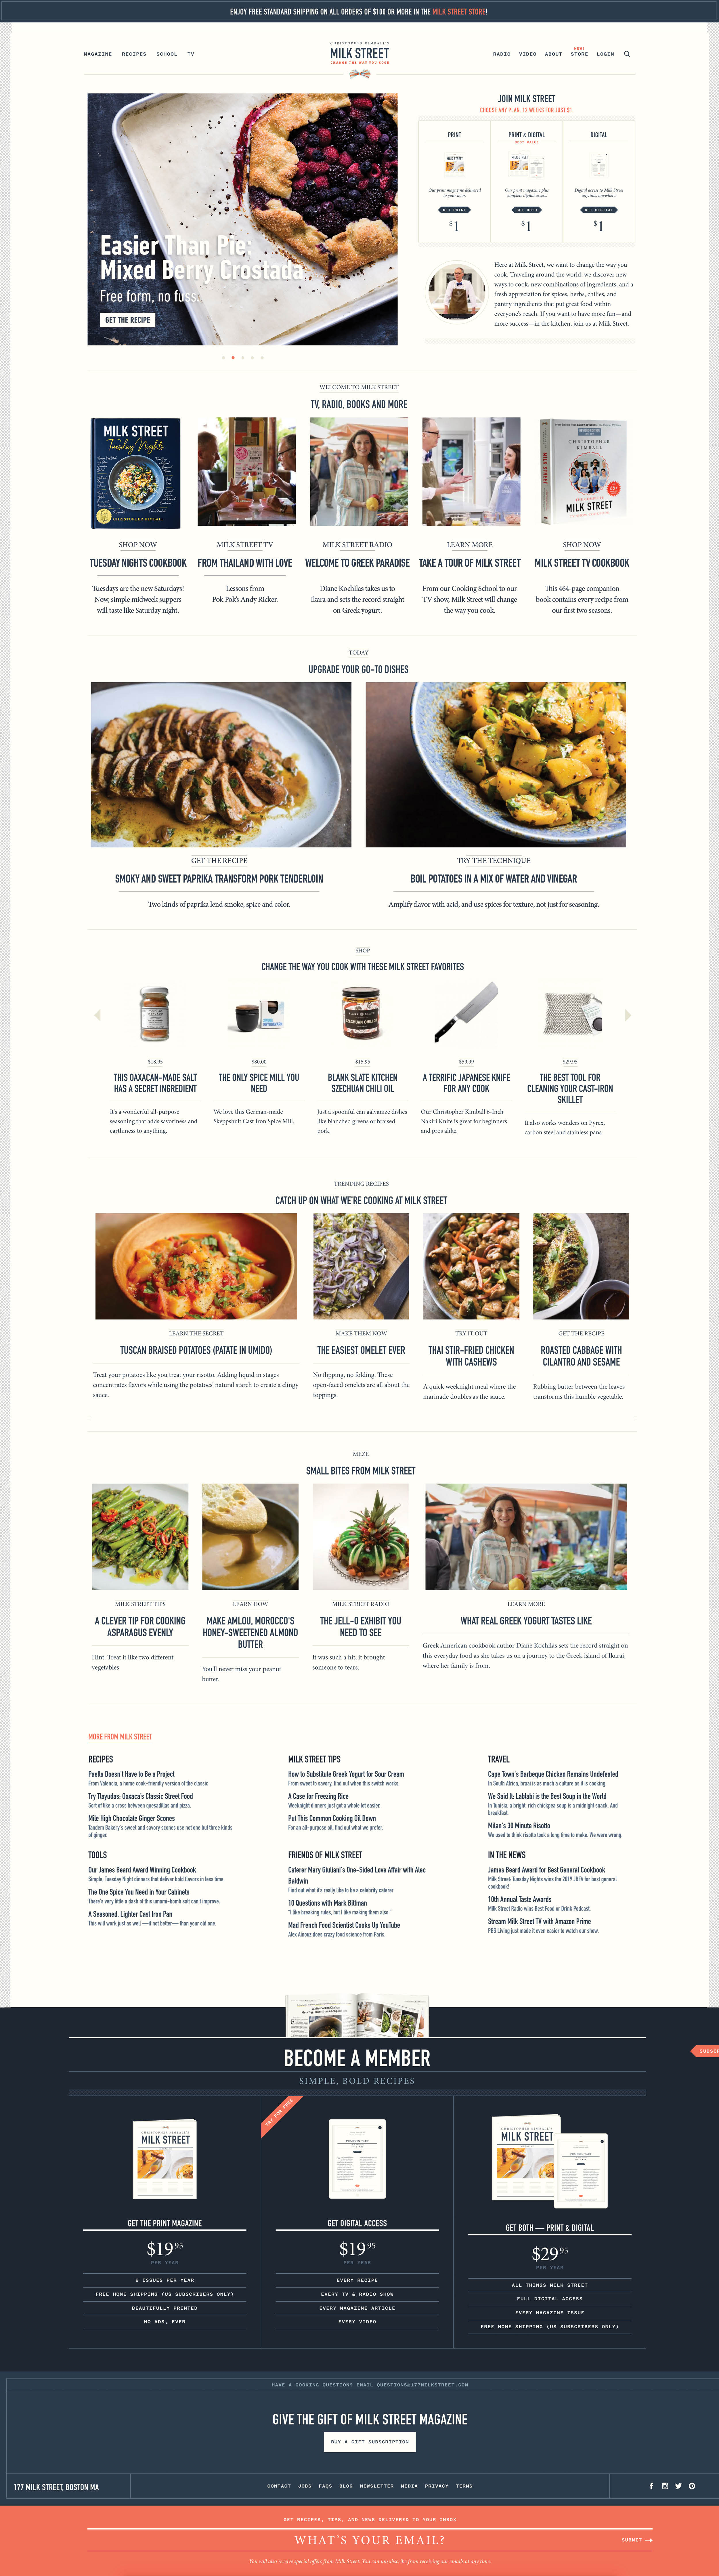 Christopher Kimball's Milk Street: Website Design